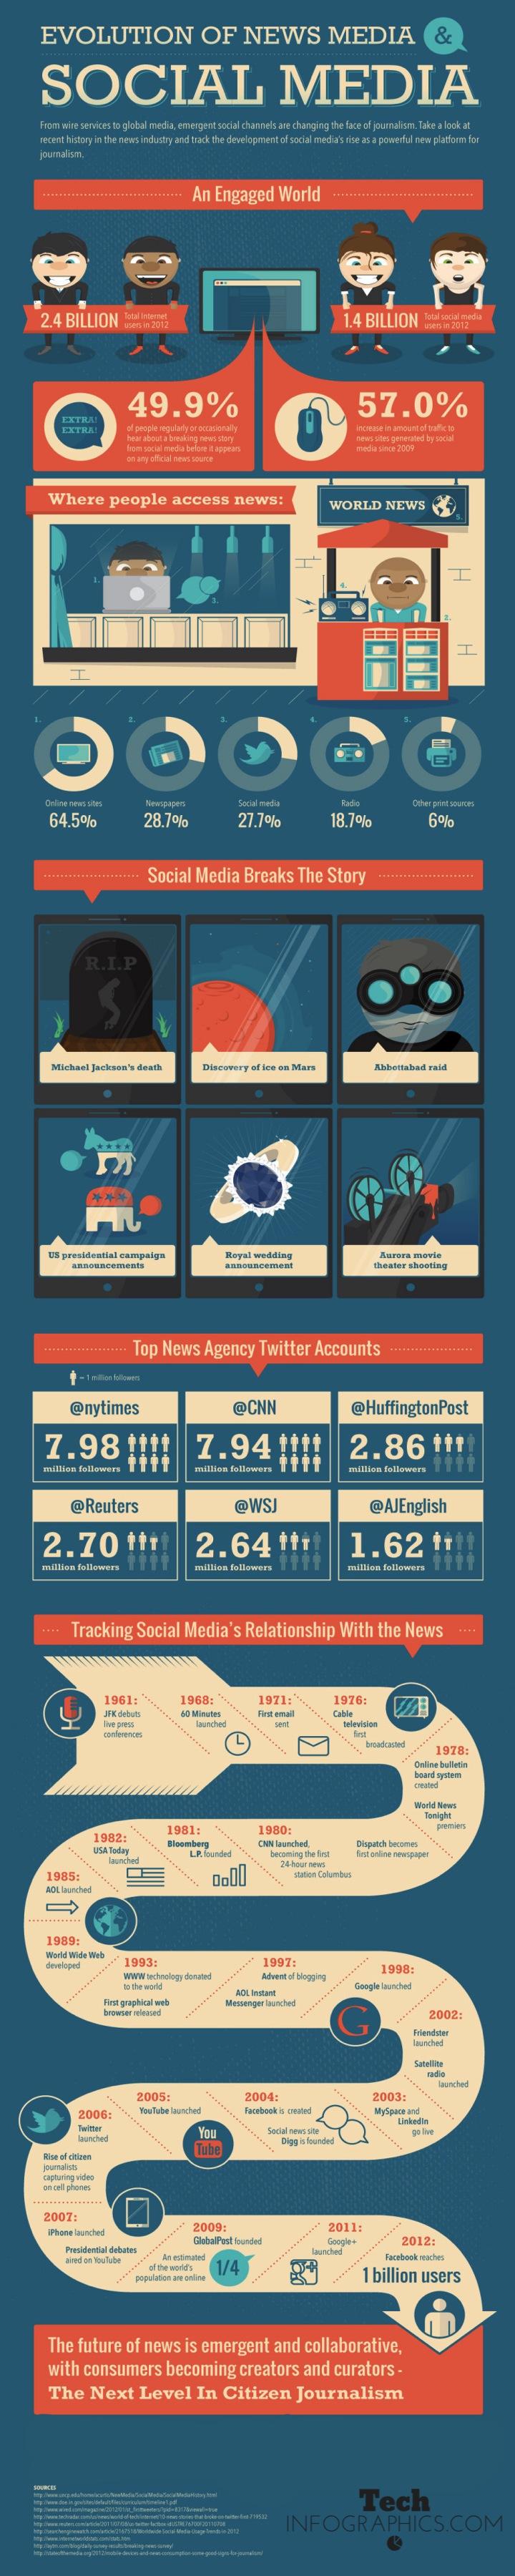 Socialmedia-news-infographic